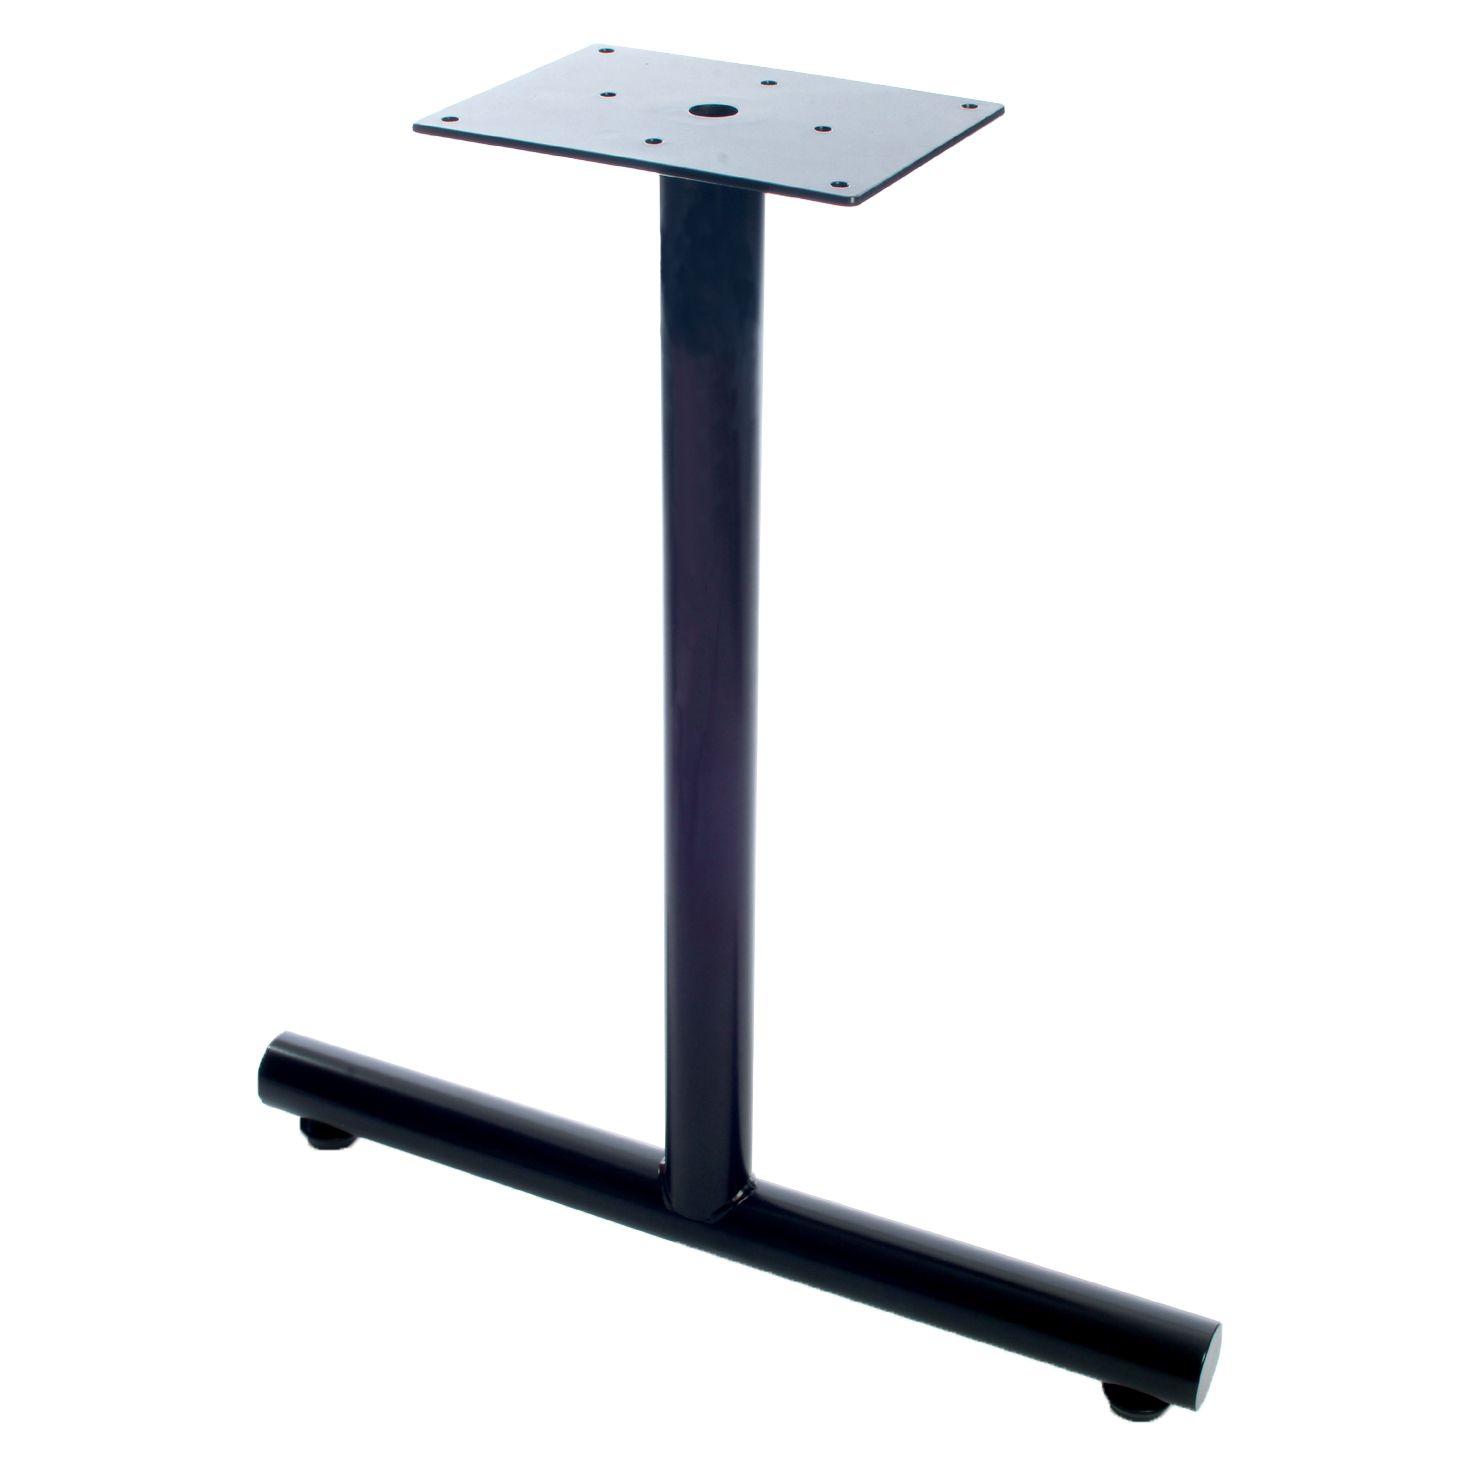 AS22T - Black Table Base